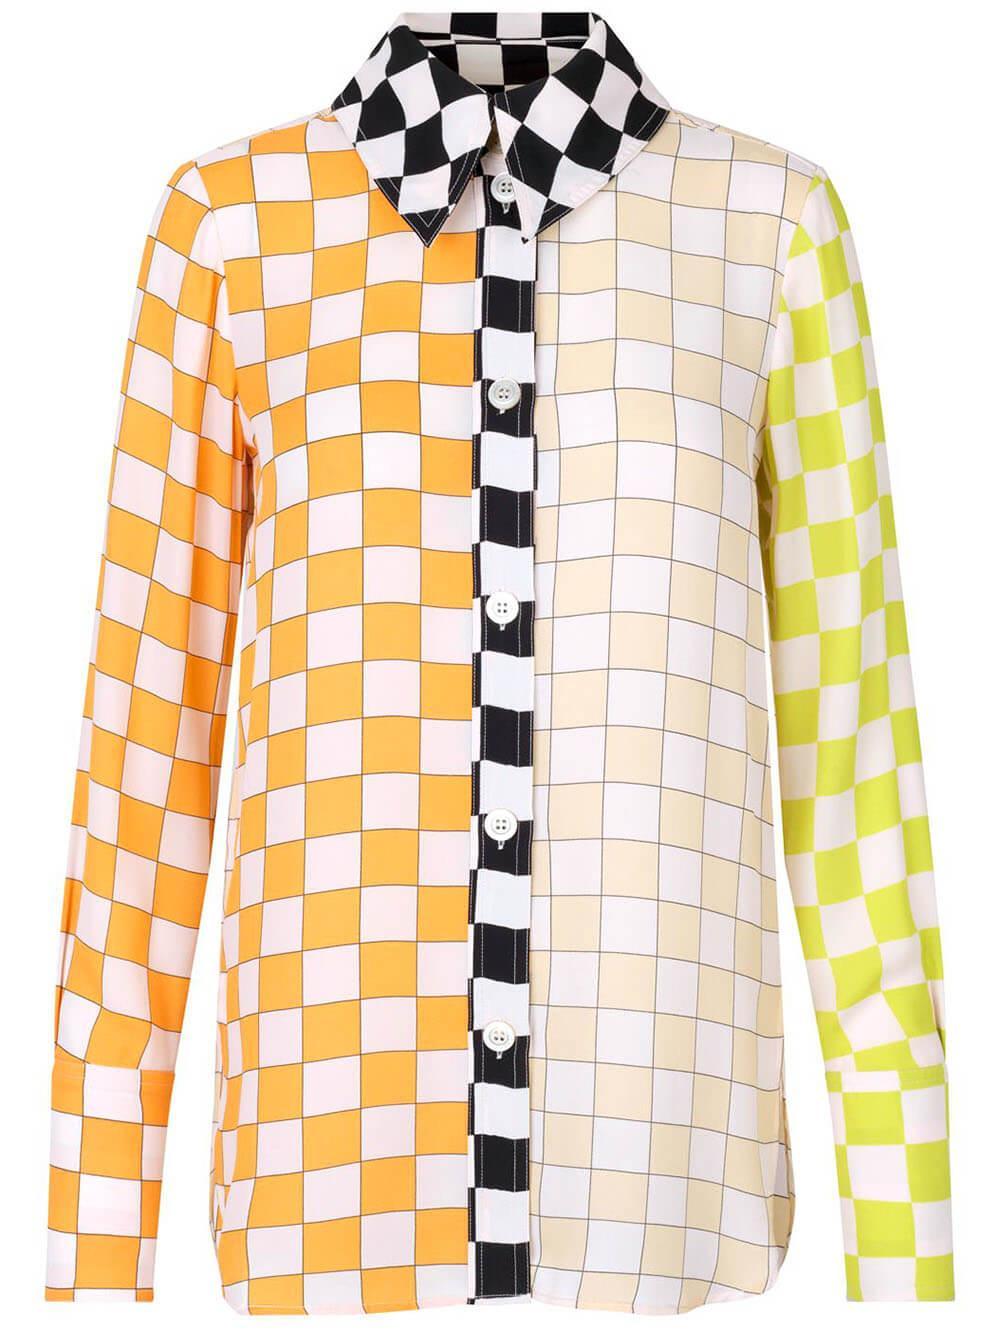 James Shirt Item # SG3570